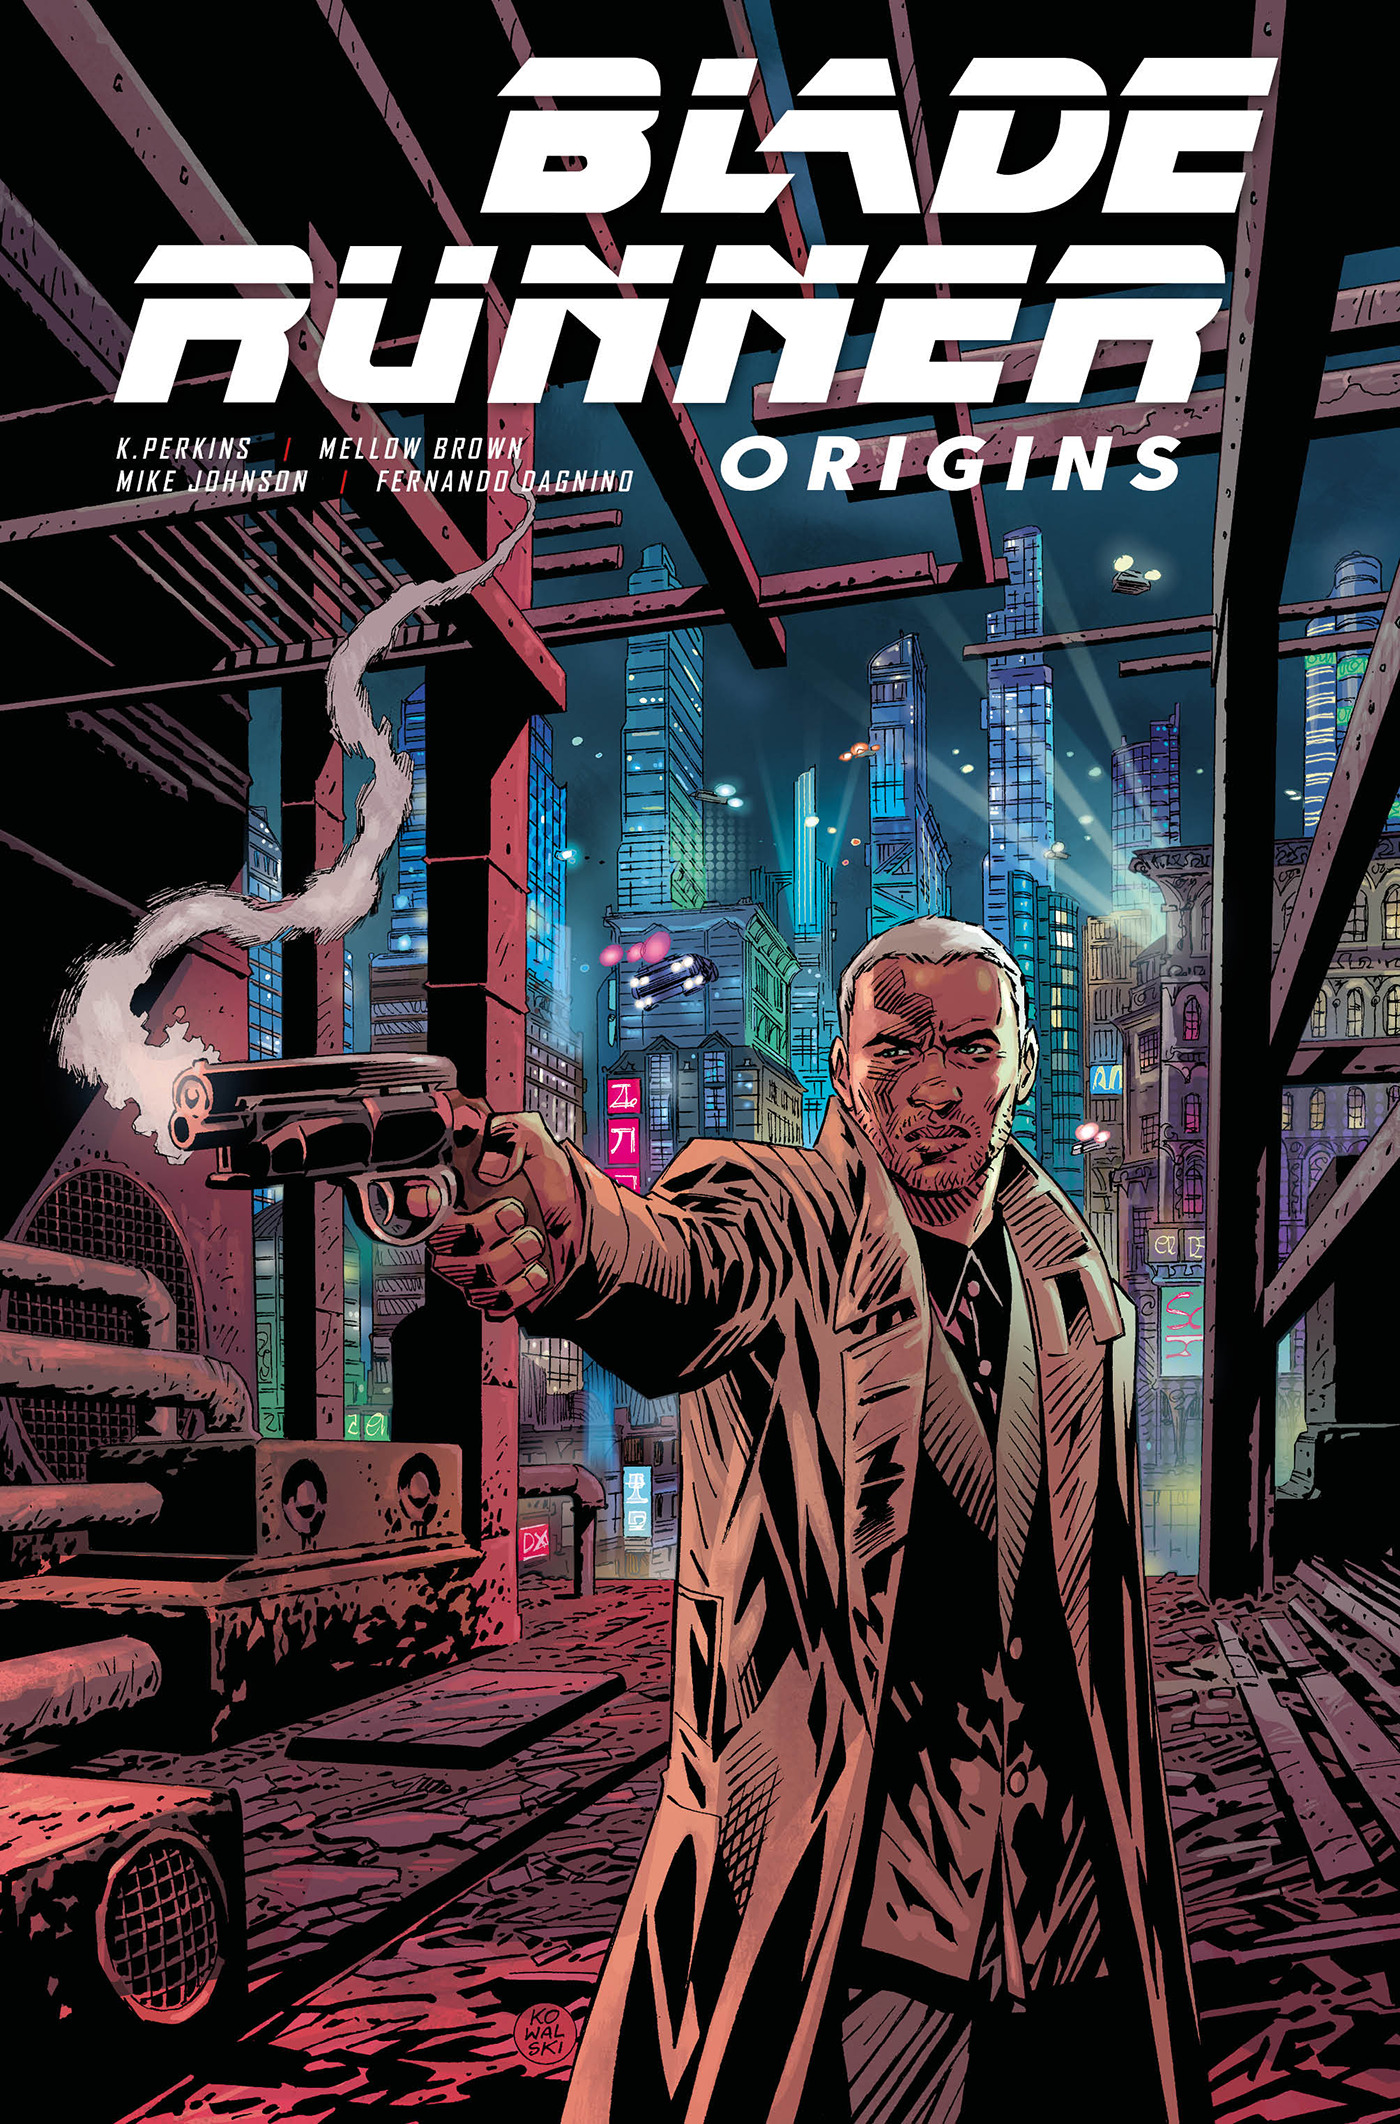 Blade Runner: Origins Vol. 1